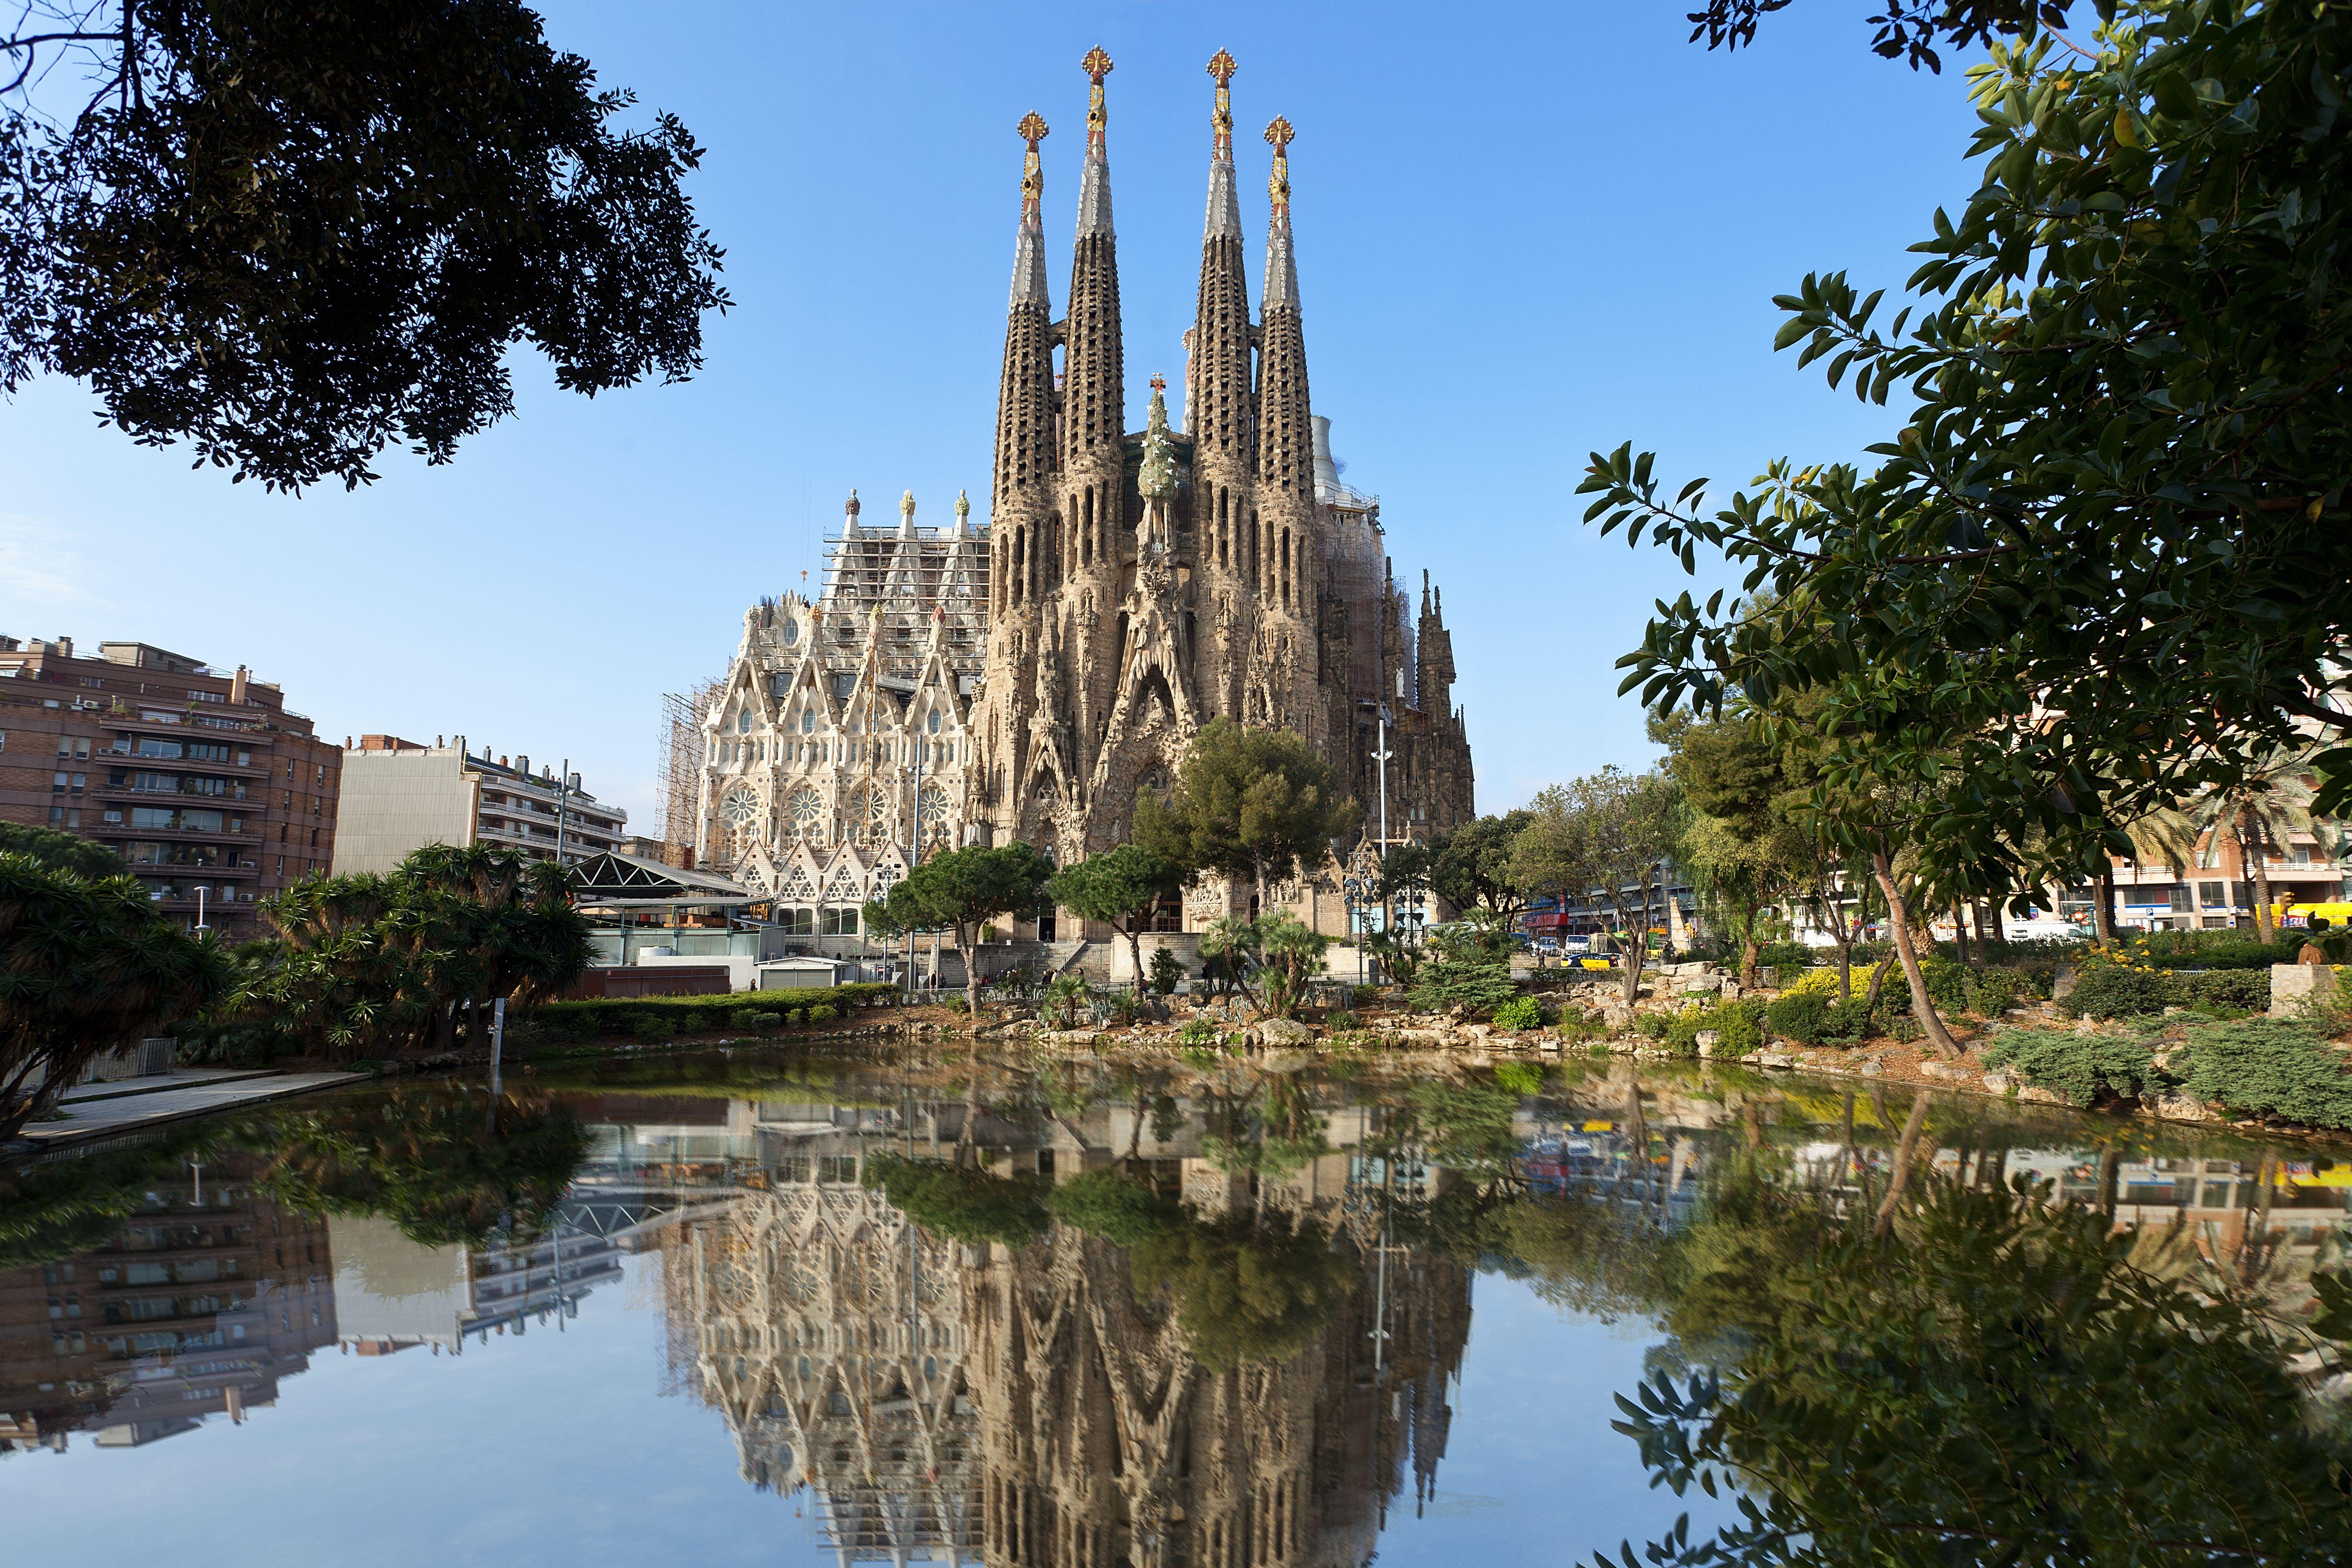 28be31736f La Sagrada Familia by Antoni Gaudí in Barcelona